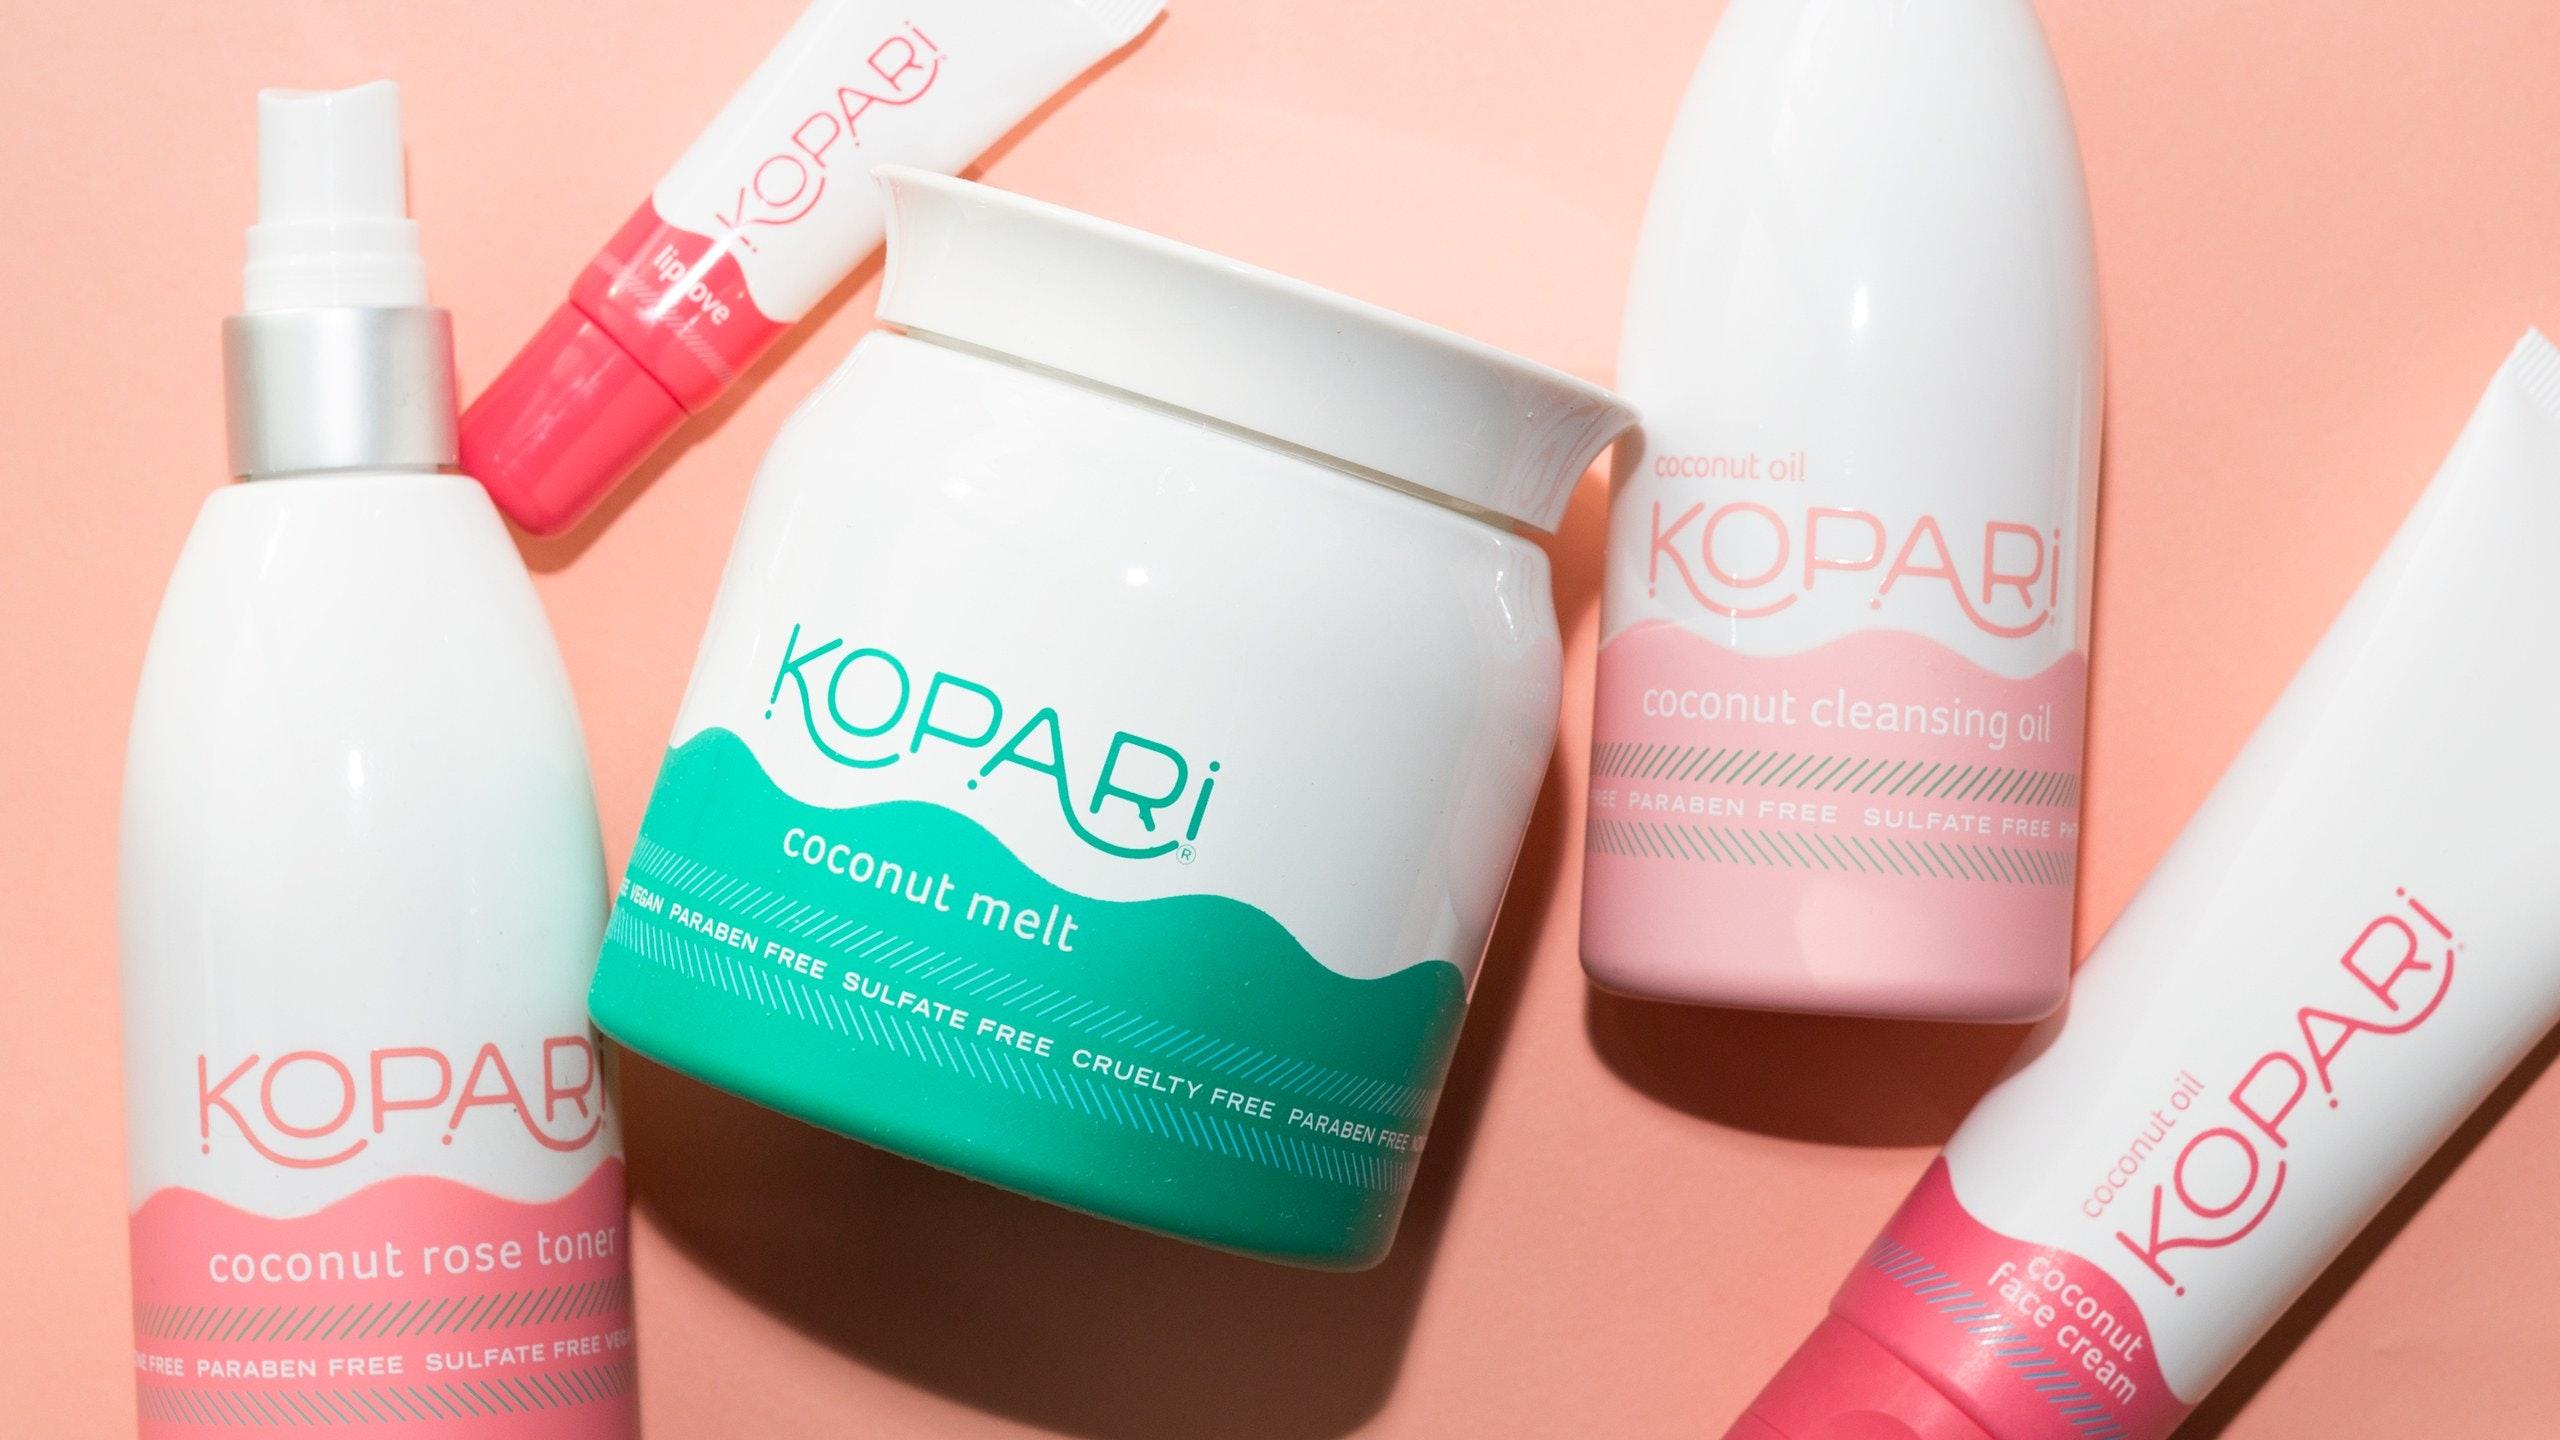 How Kopari Founders Kiana Cabell and Gigi Goldman Built a Beauty Empire on Coconuts